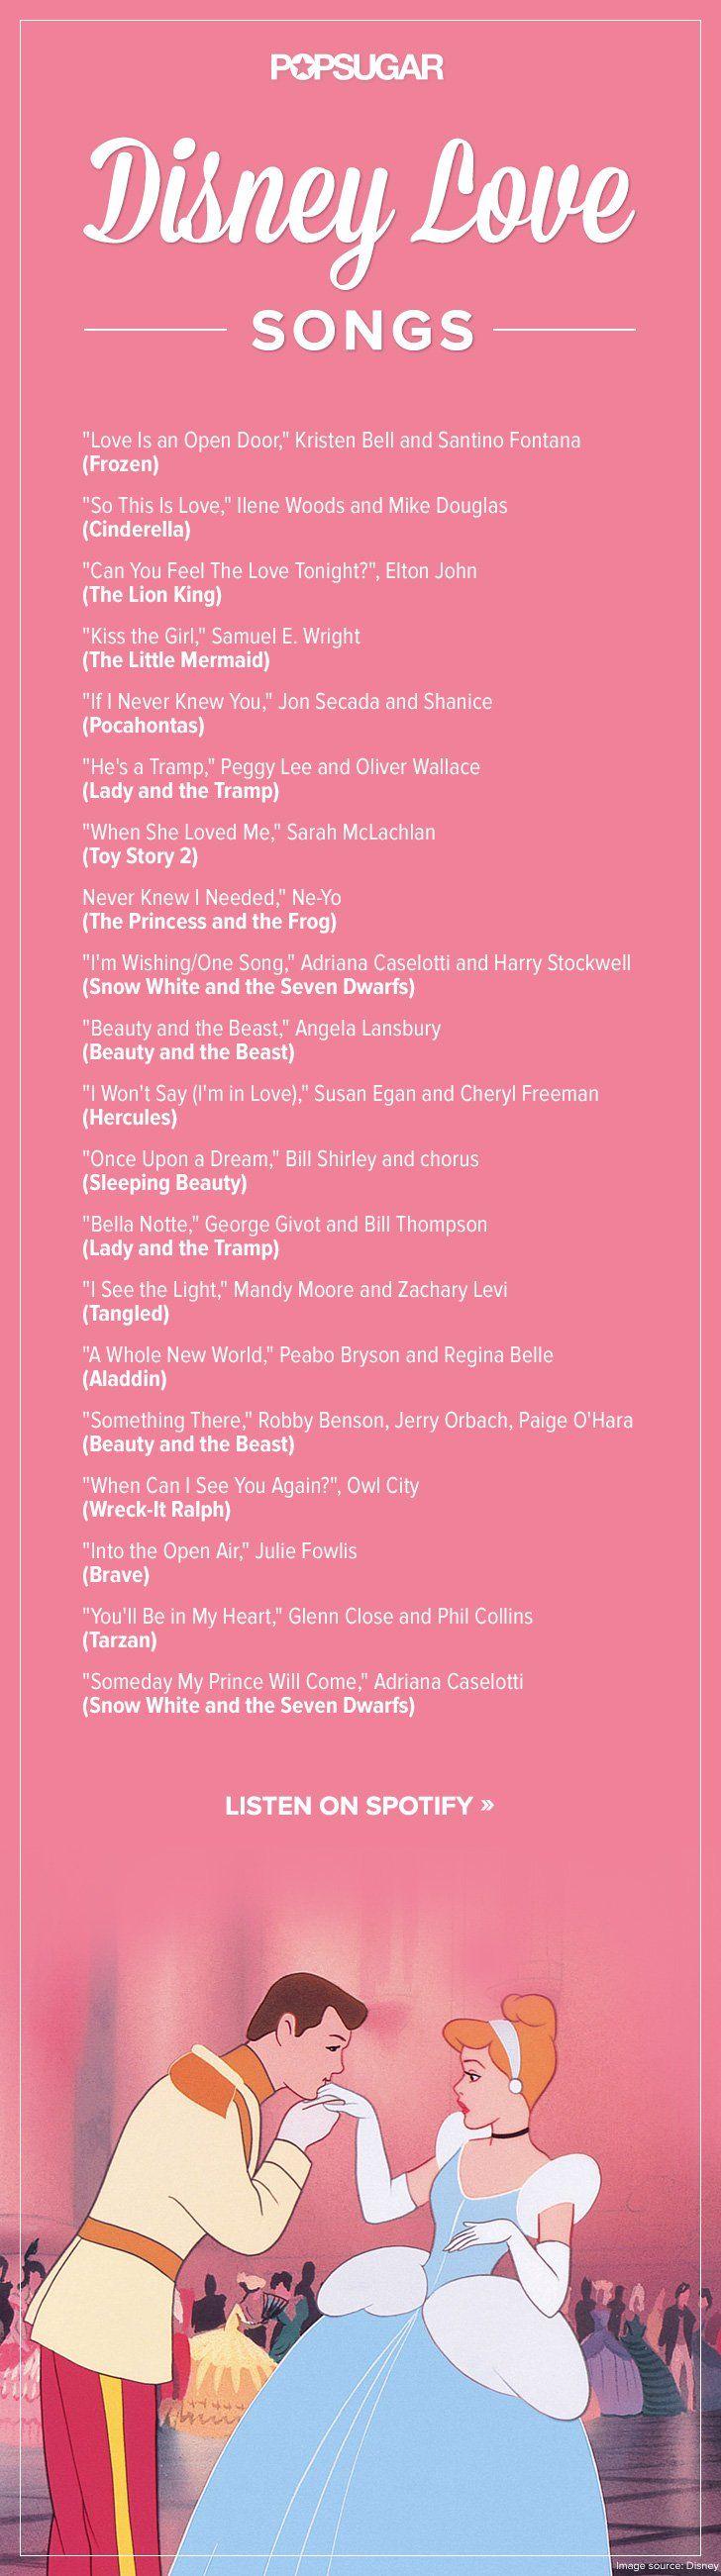 Feel the Love Tonight With This Romantic Disney Playlist